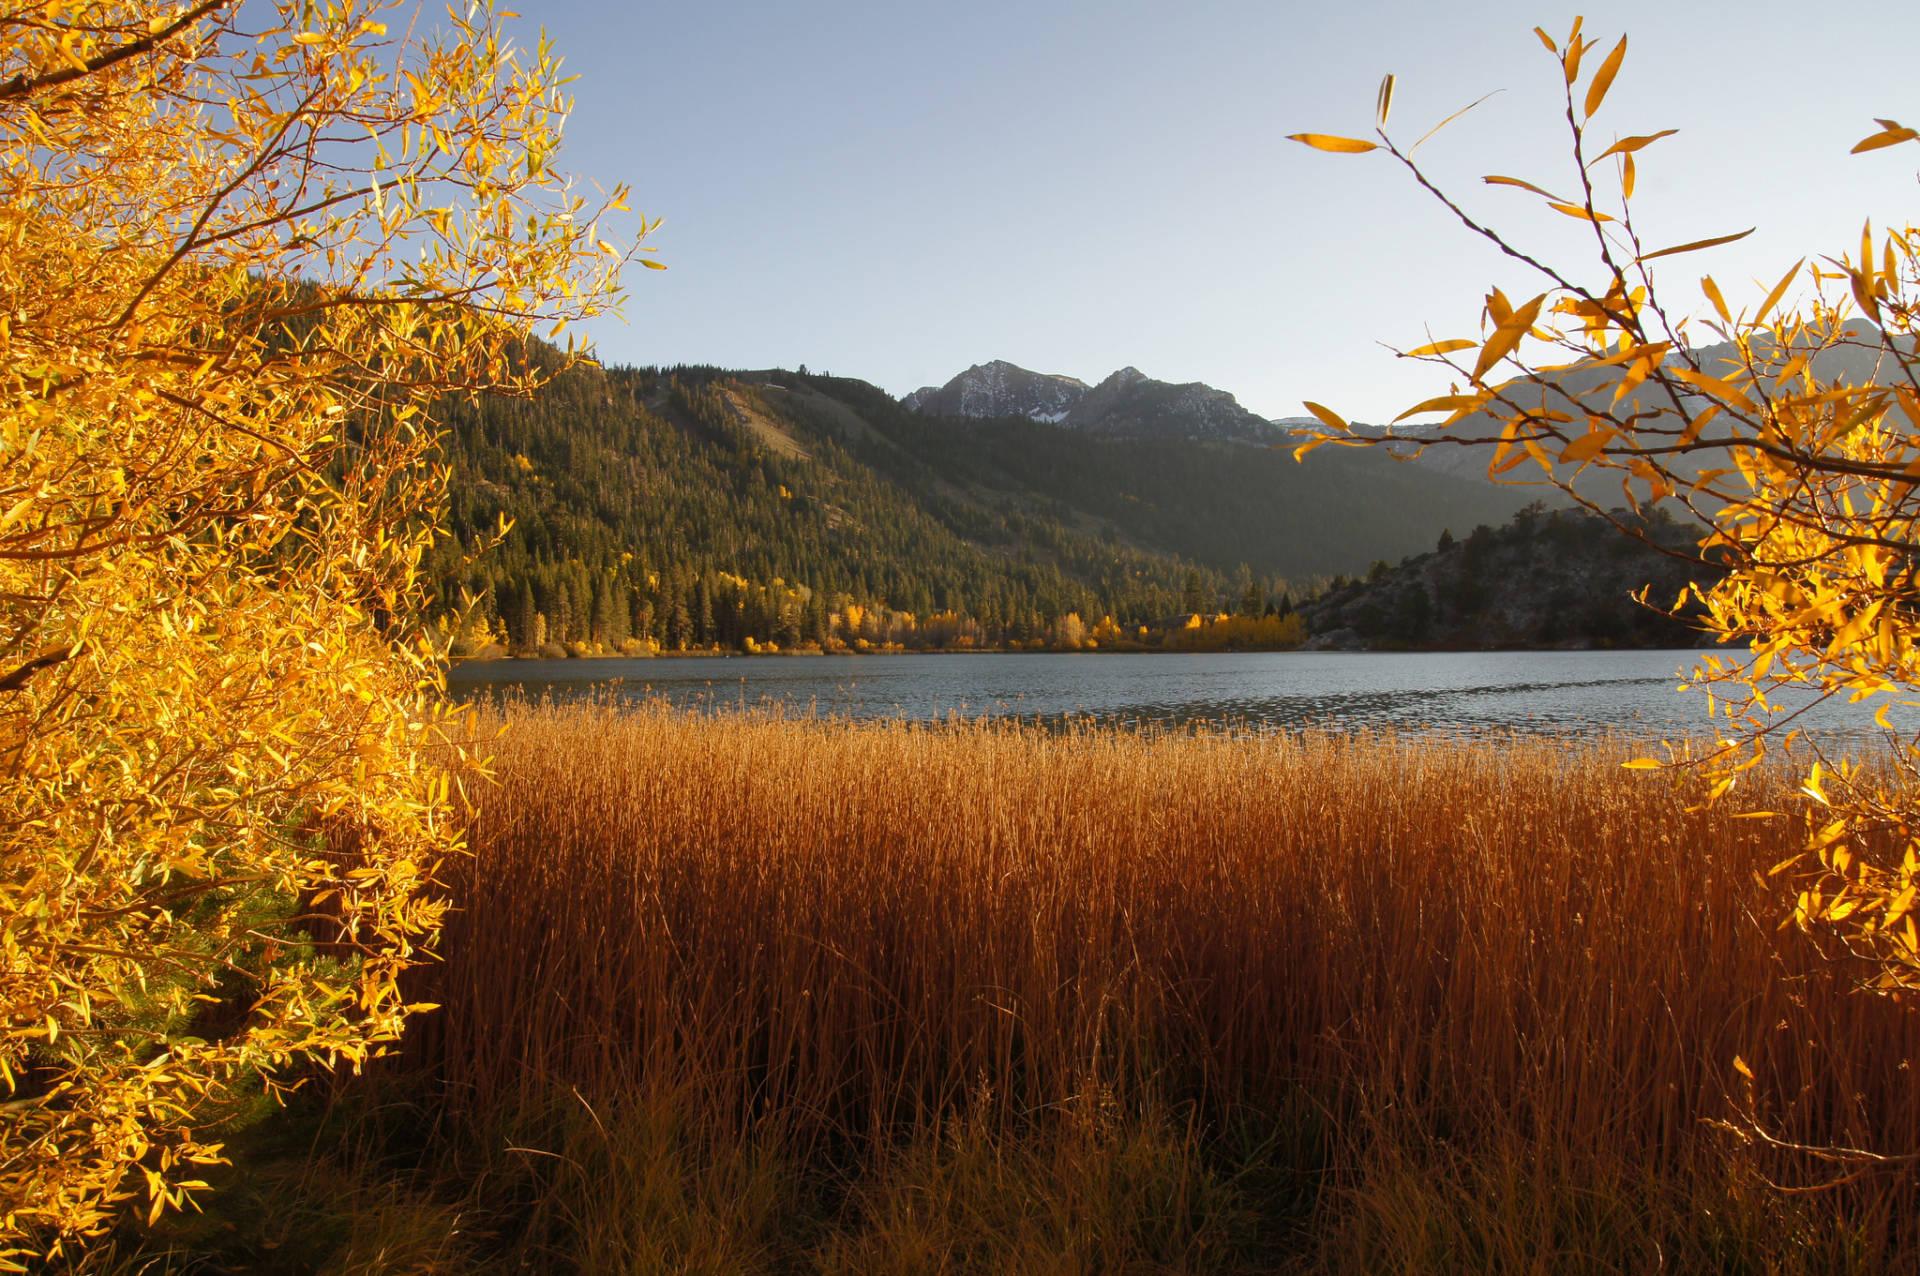 Fall foliage in the Sierra Nevada Allie Caulfield / Flickr